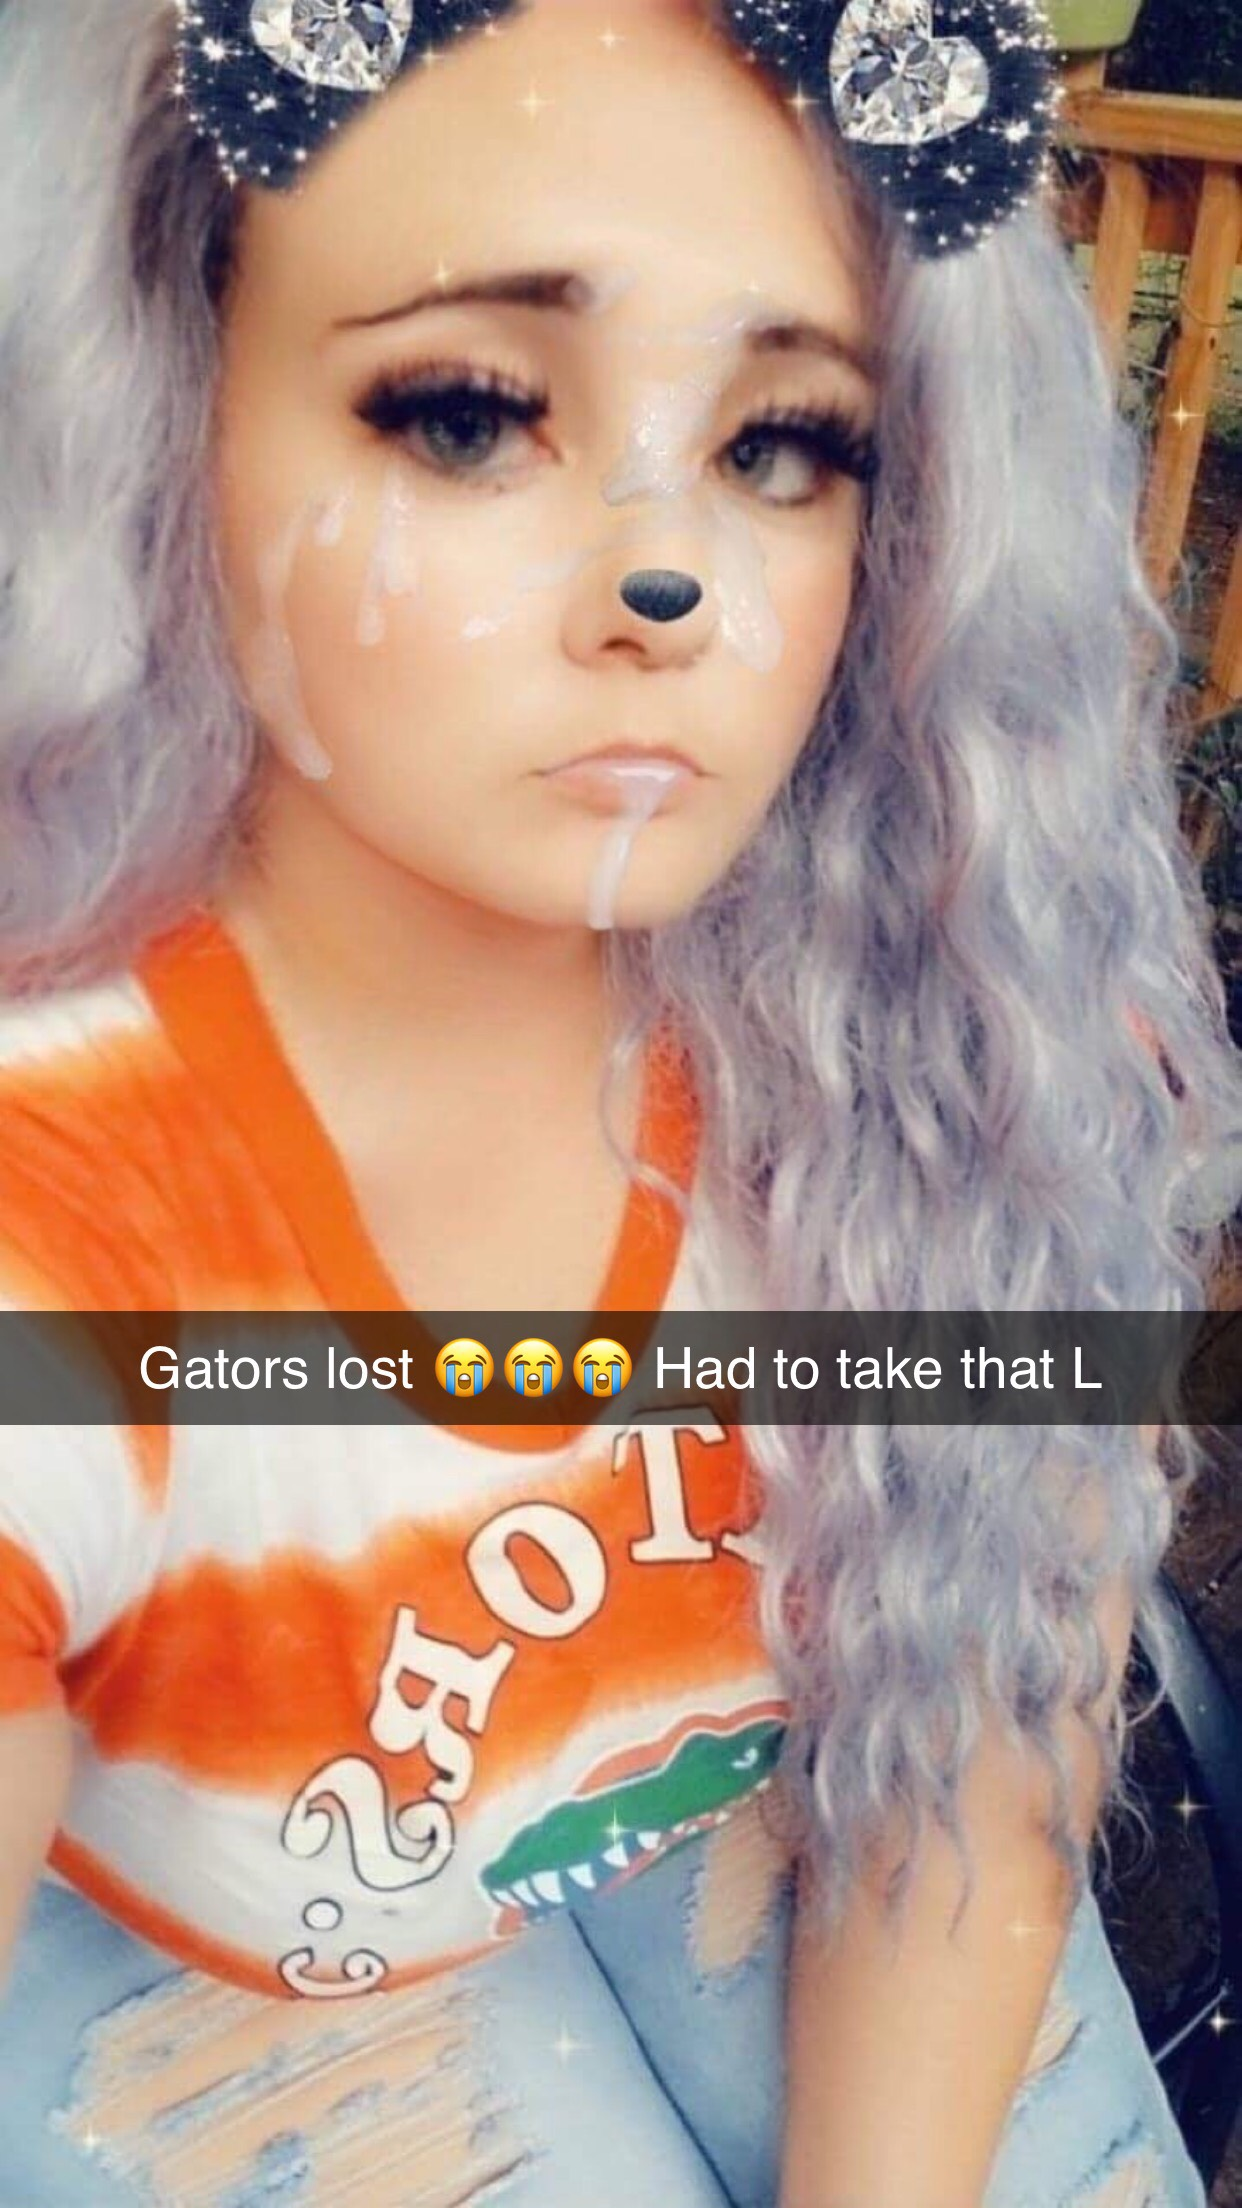 Football Girl Loses and Takes a Facial